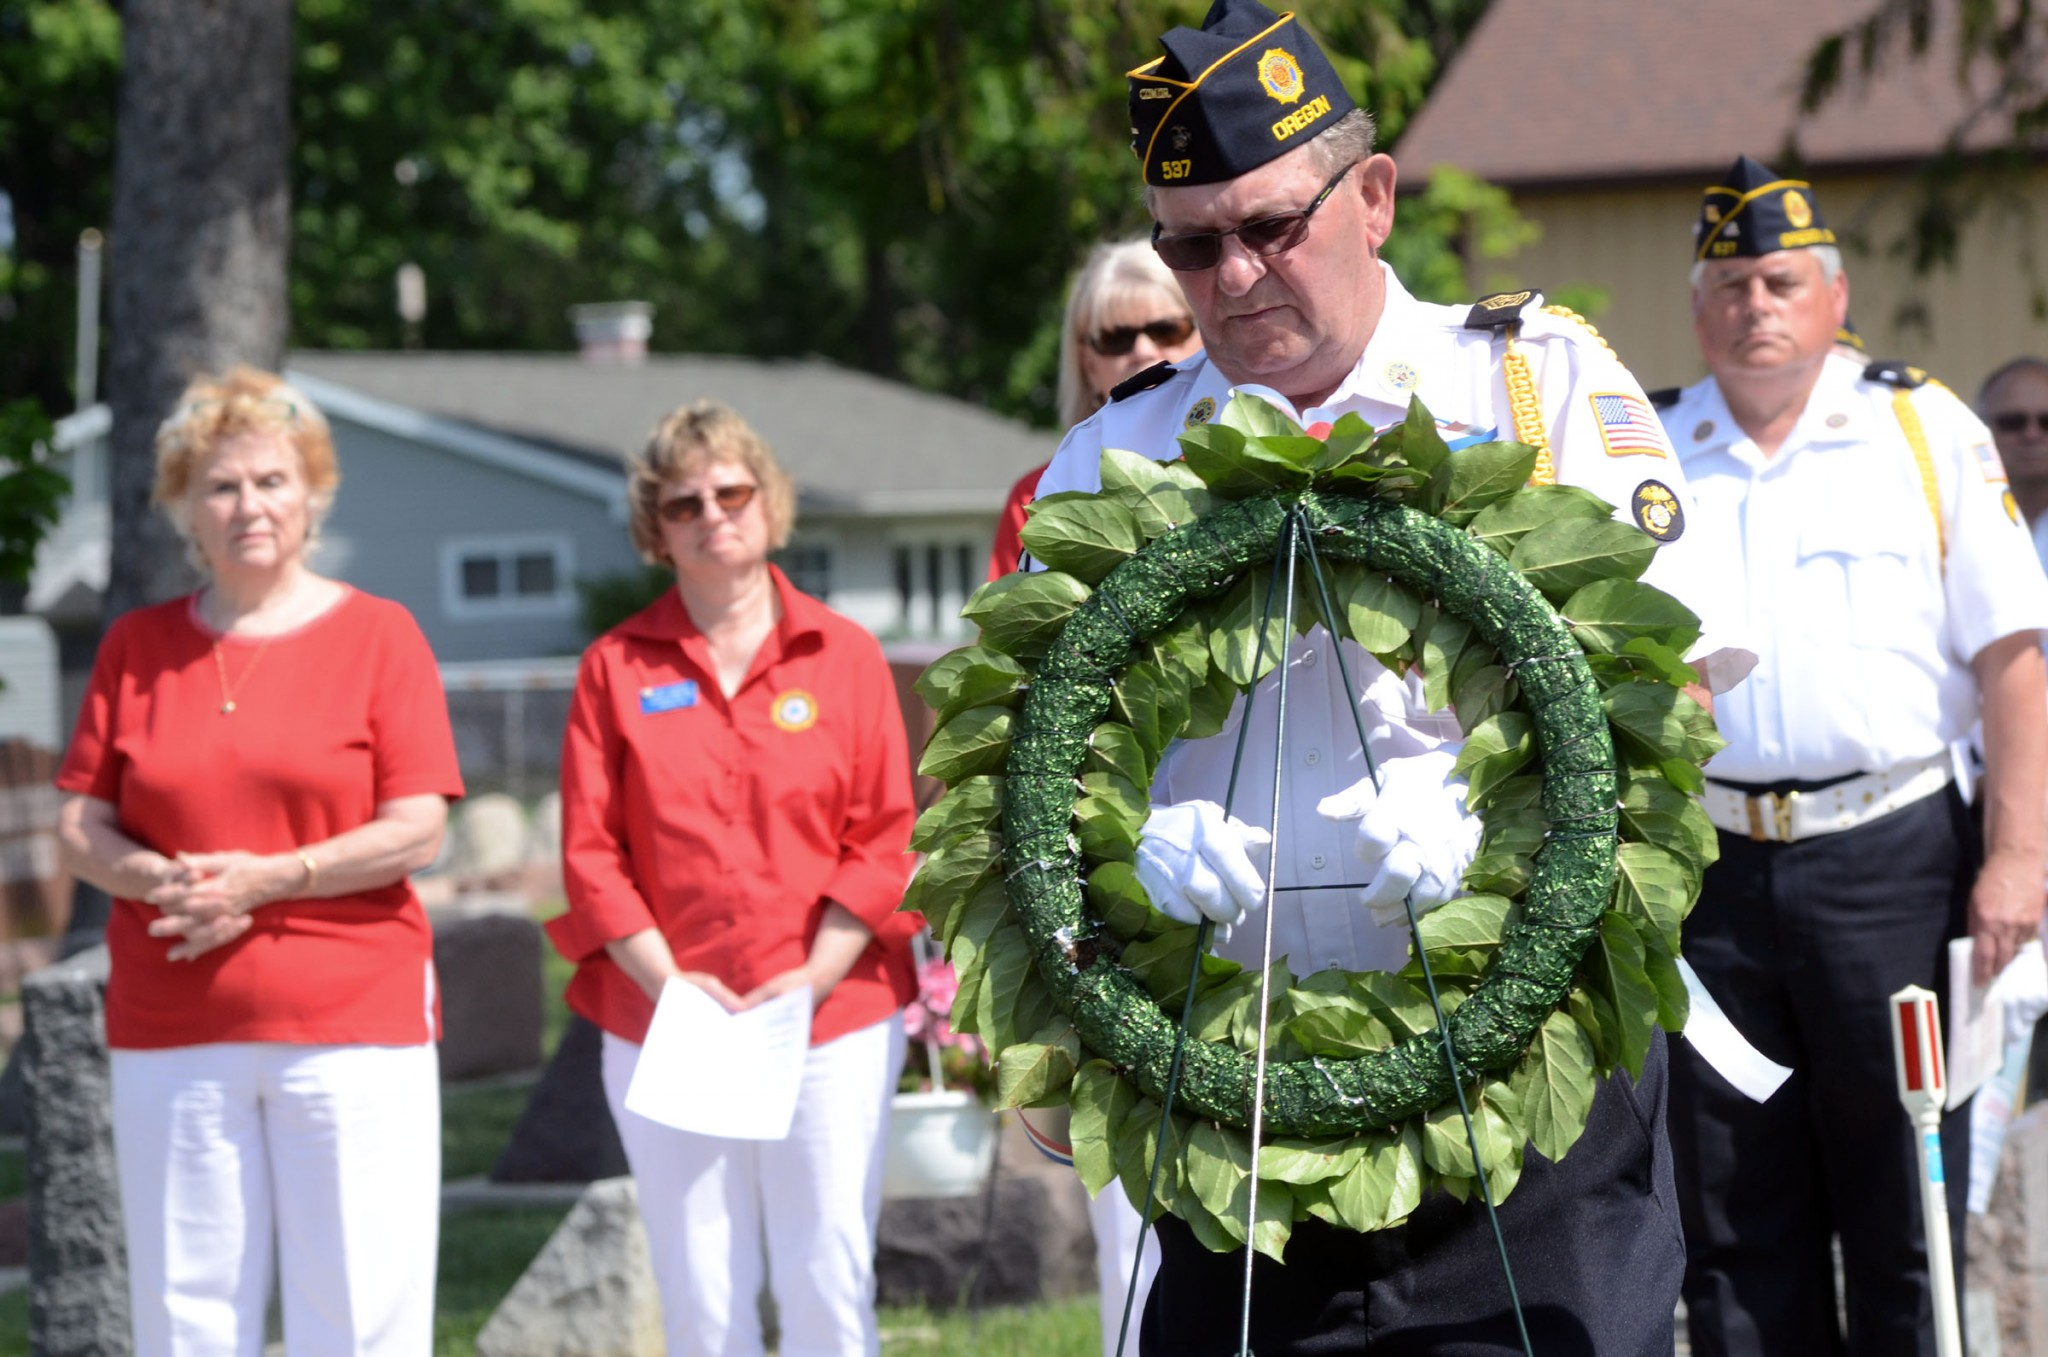 members of Christ Dunberger American Legion Post 537 at a Memorial Day celebration. (Press file photo by Ken Grosjean)